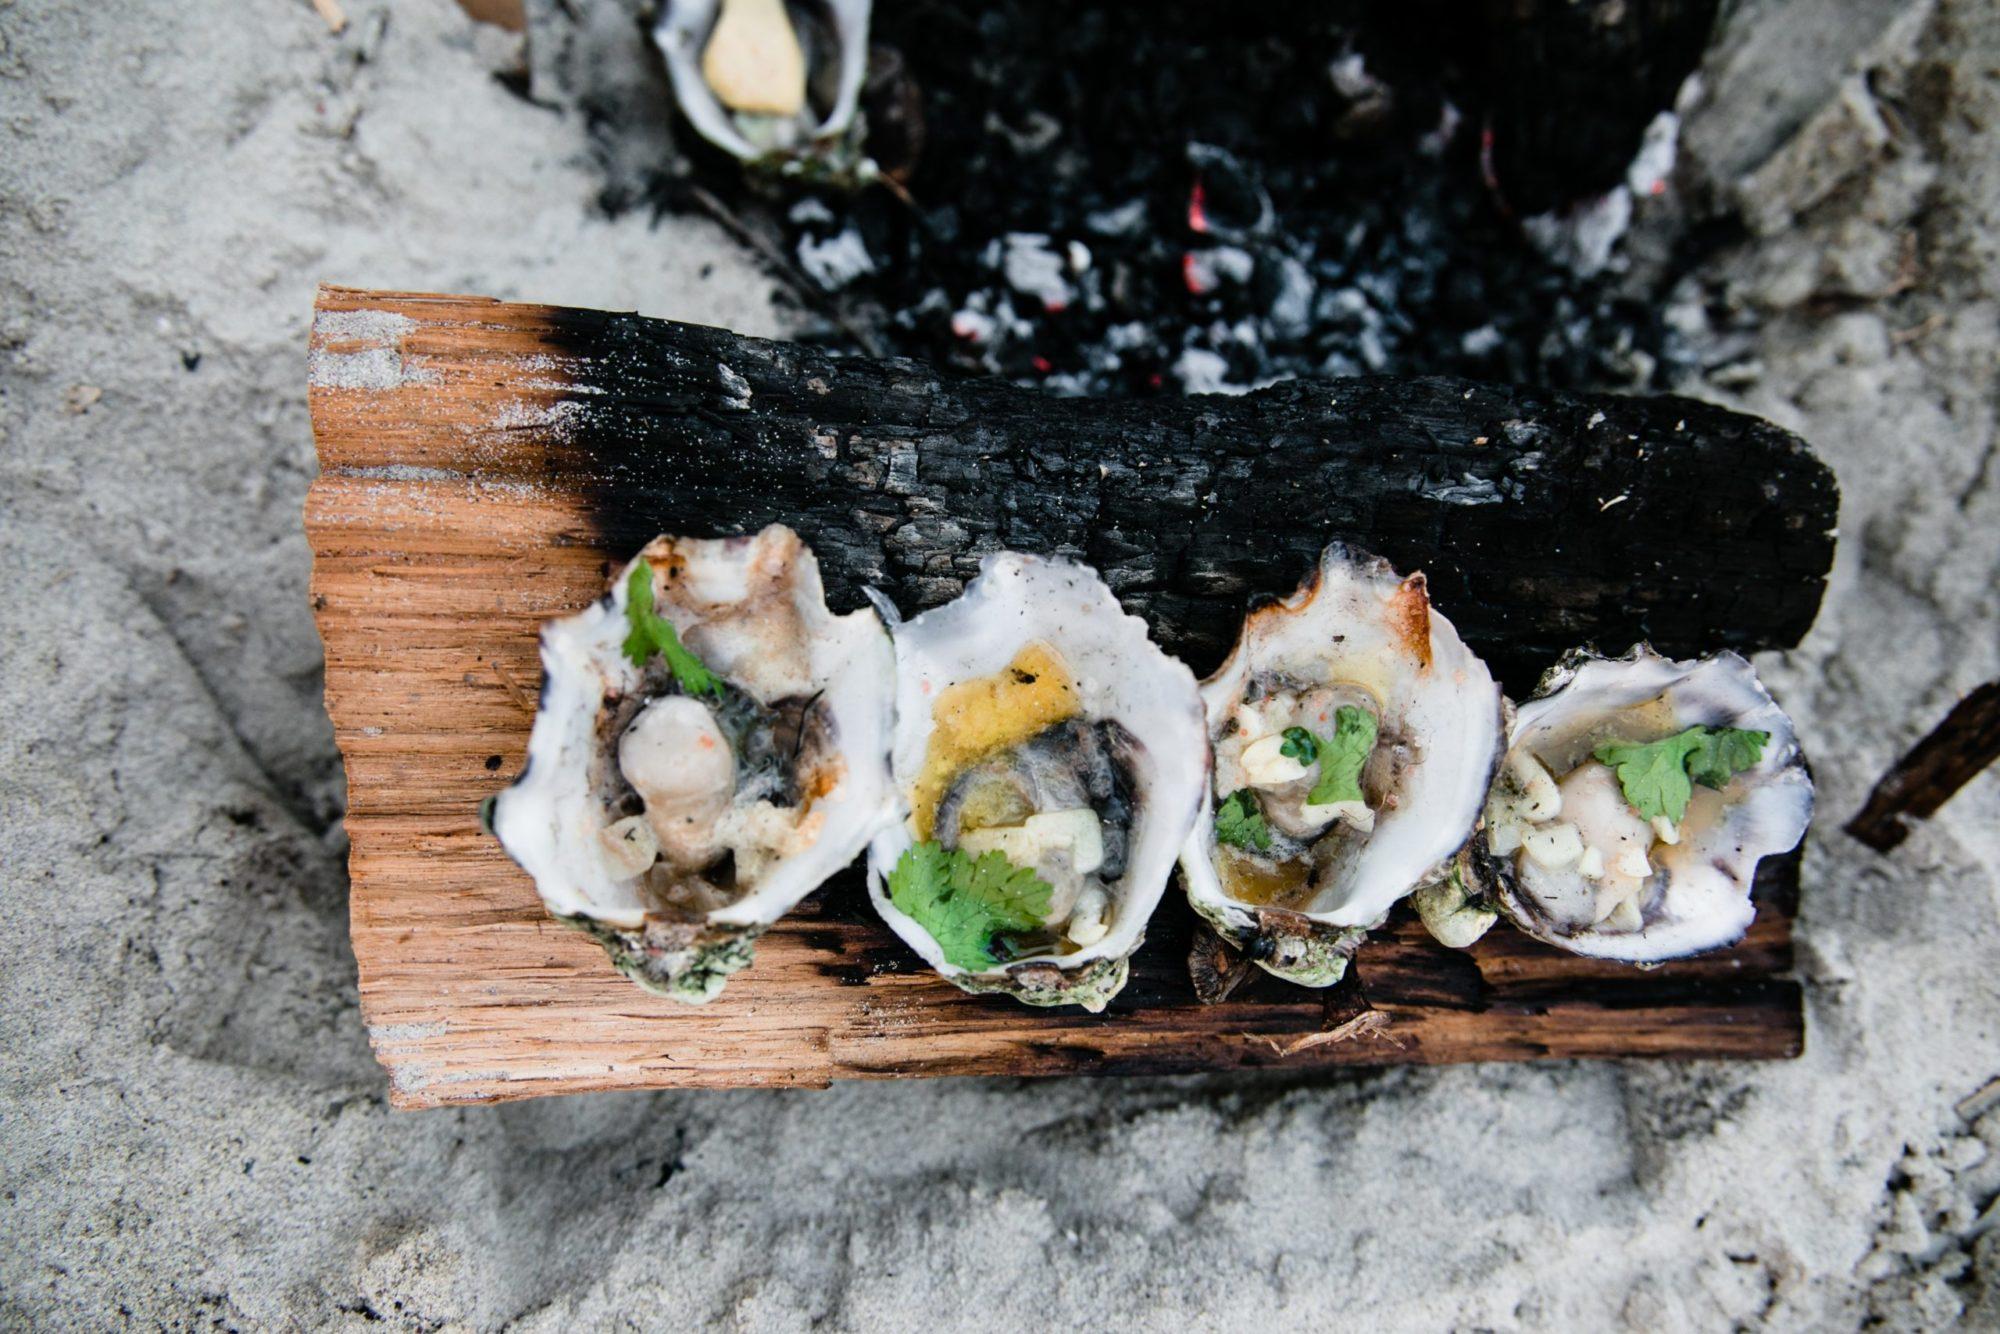 oesters rapen - oesters rapen nederland - oesters rapen in nederland - oesters in nederland - oesters zelf rapen nederland - oesters rapen tips - oesters rapen hoe - waar oesters rapen - wanneer oesters rapen